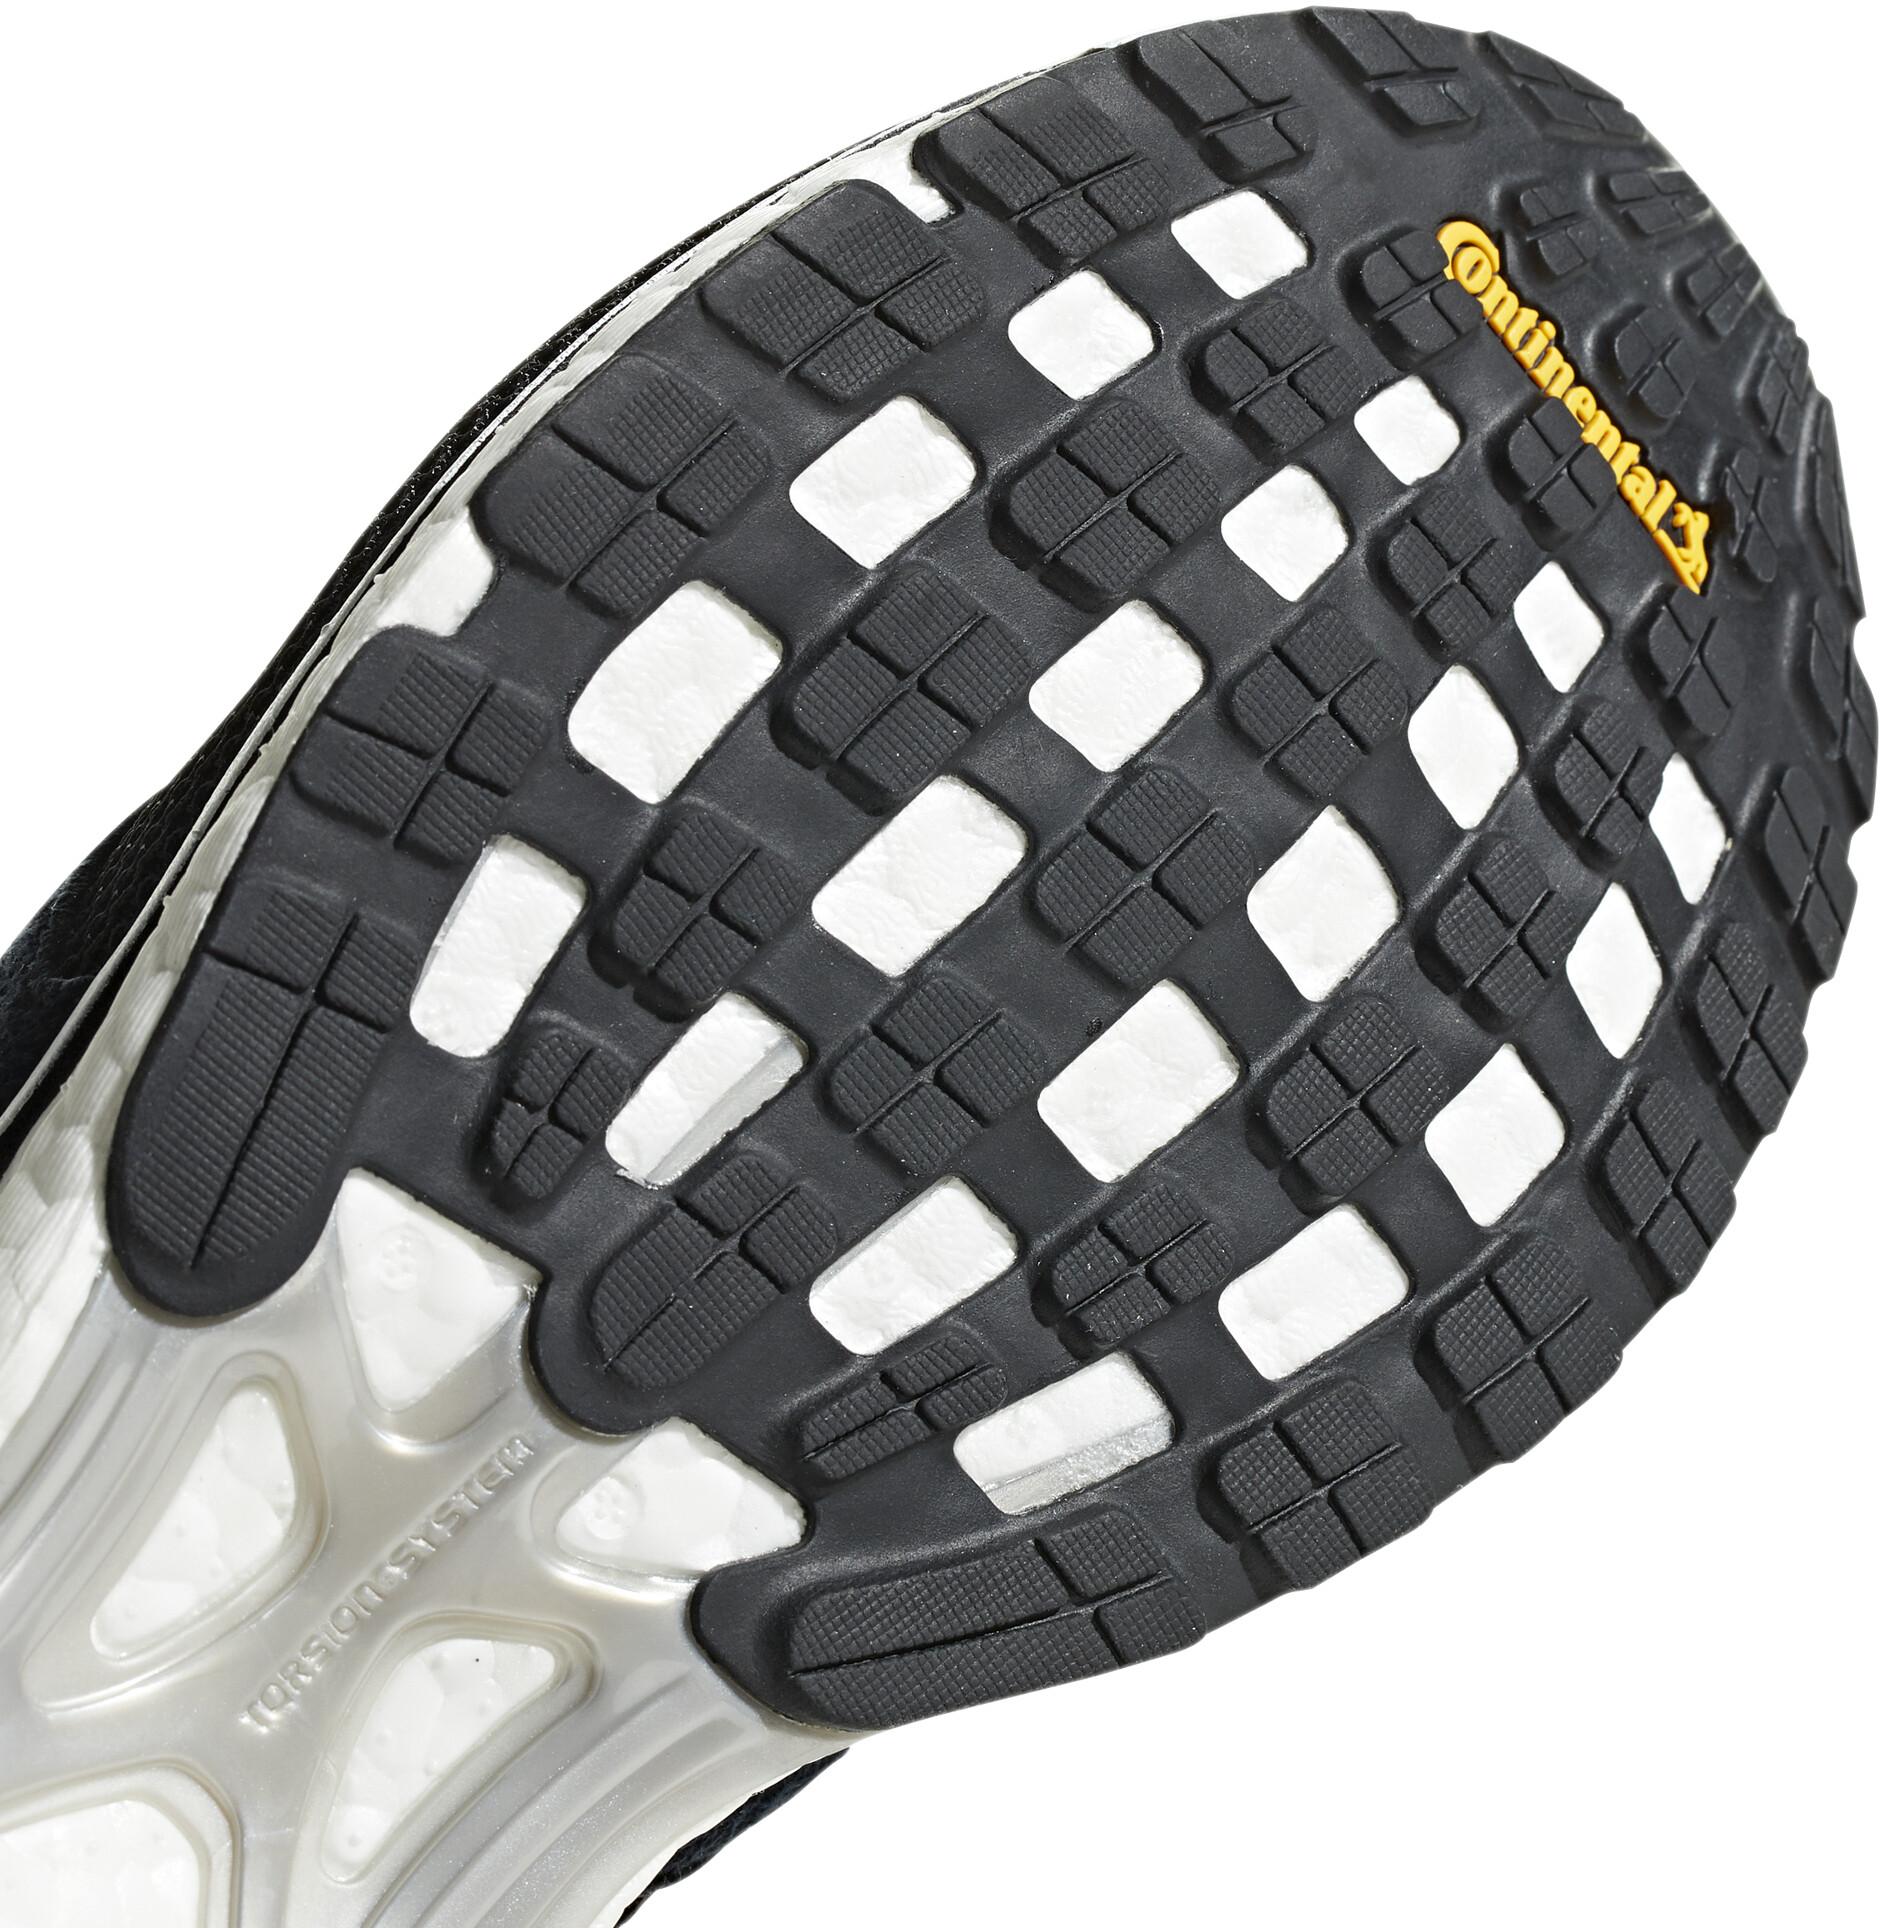 a2193d03 adidas Adizero Adios 4 Hardloopschoenen Dames, core black/ftwr white/core  black